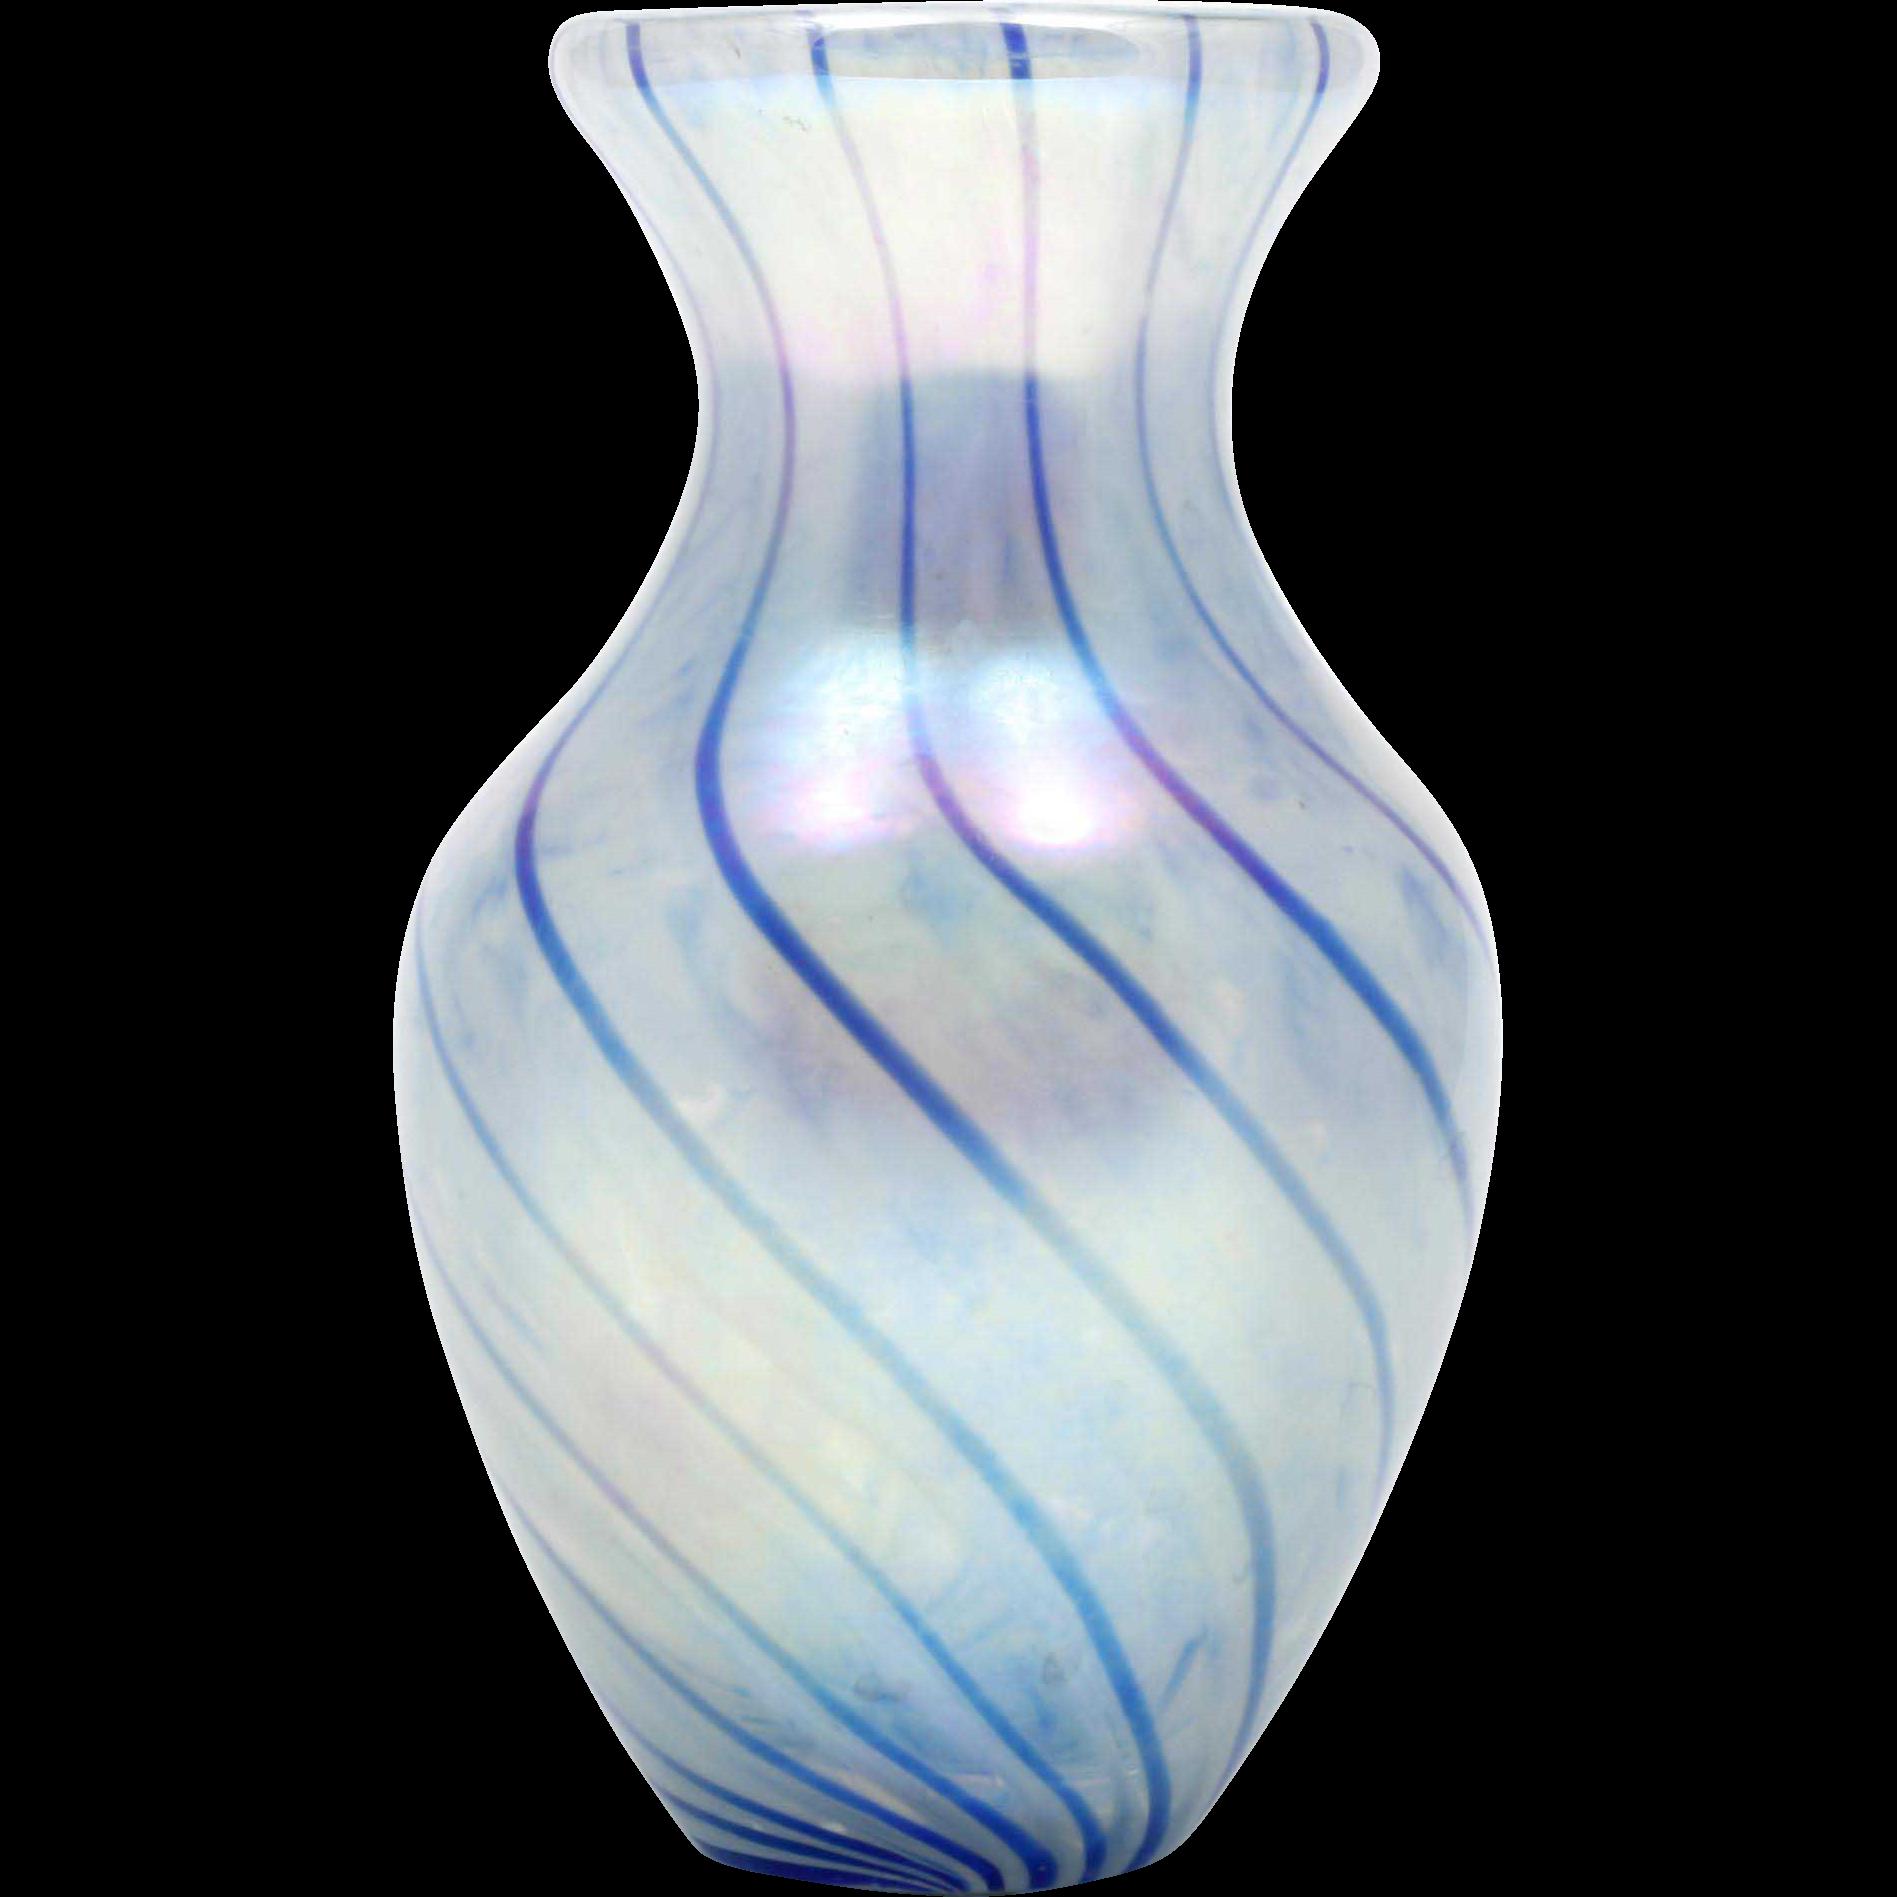 MSH Ash Art Glass Vase Cobalt Blue Spiral Iridescent Hand Blown Made in the USA